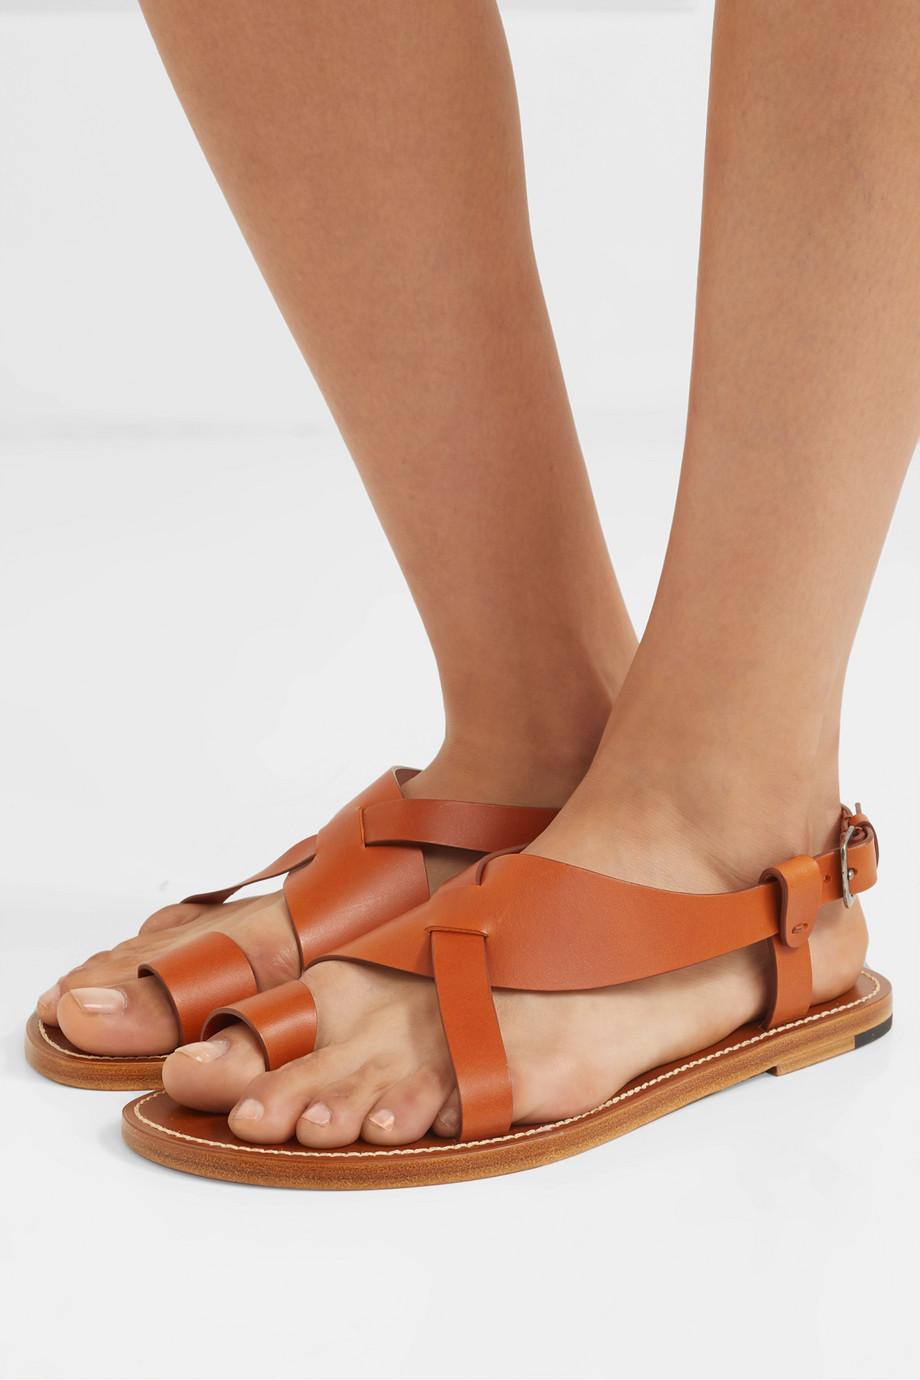 Bottega Veneta Woven leather sandals